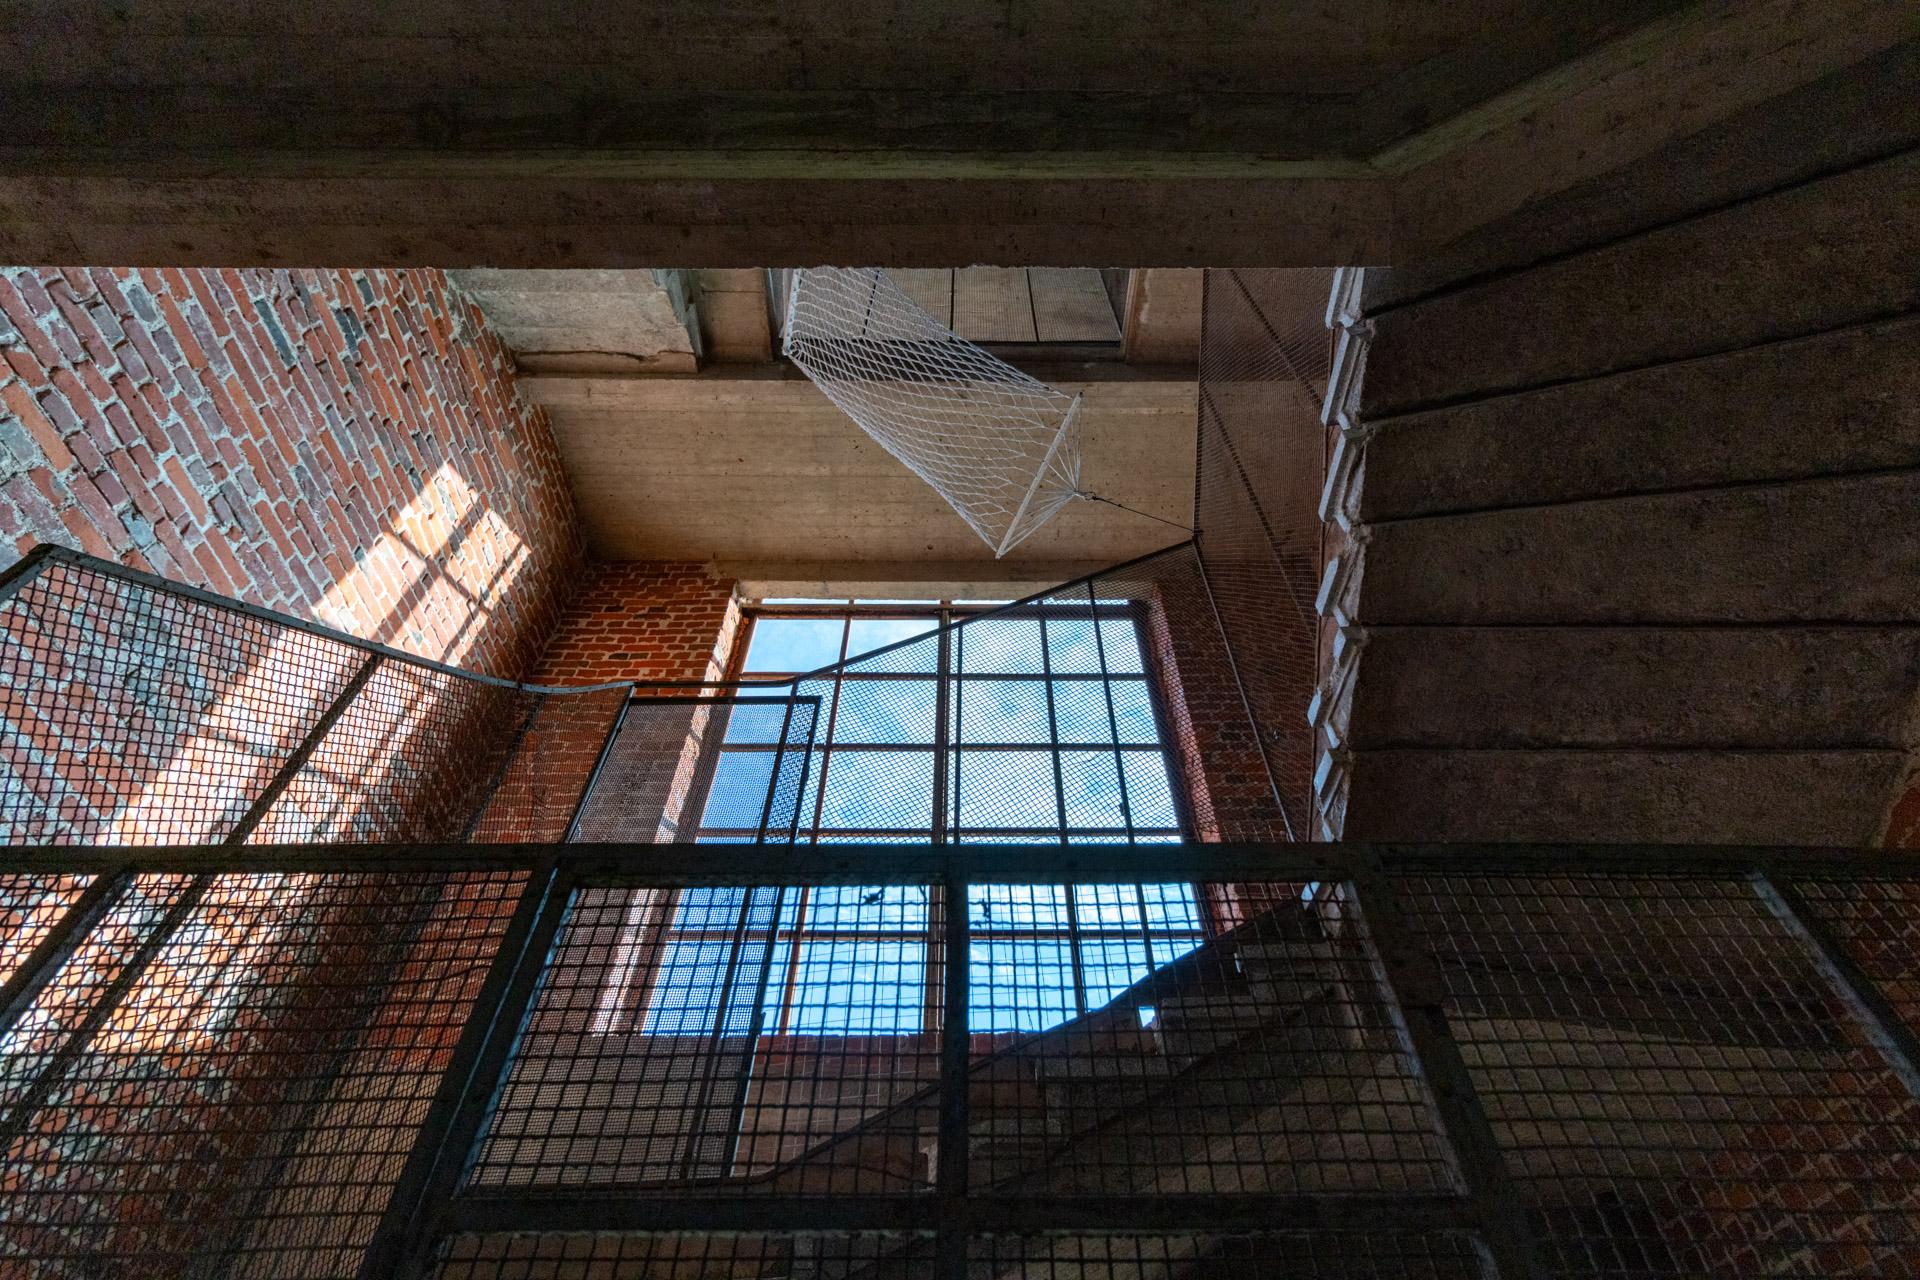 На седьмом небе, сайт-специфик-инсталляция — Елена Губанова, Иван Говорков, 2021